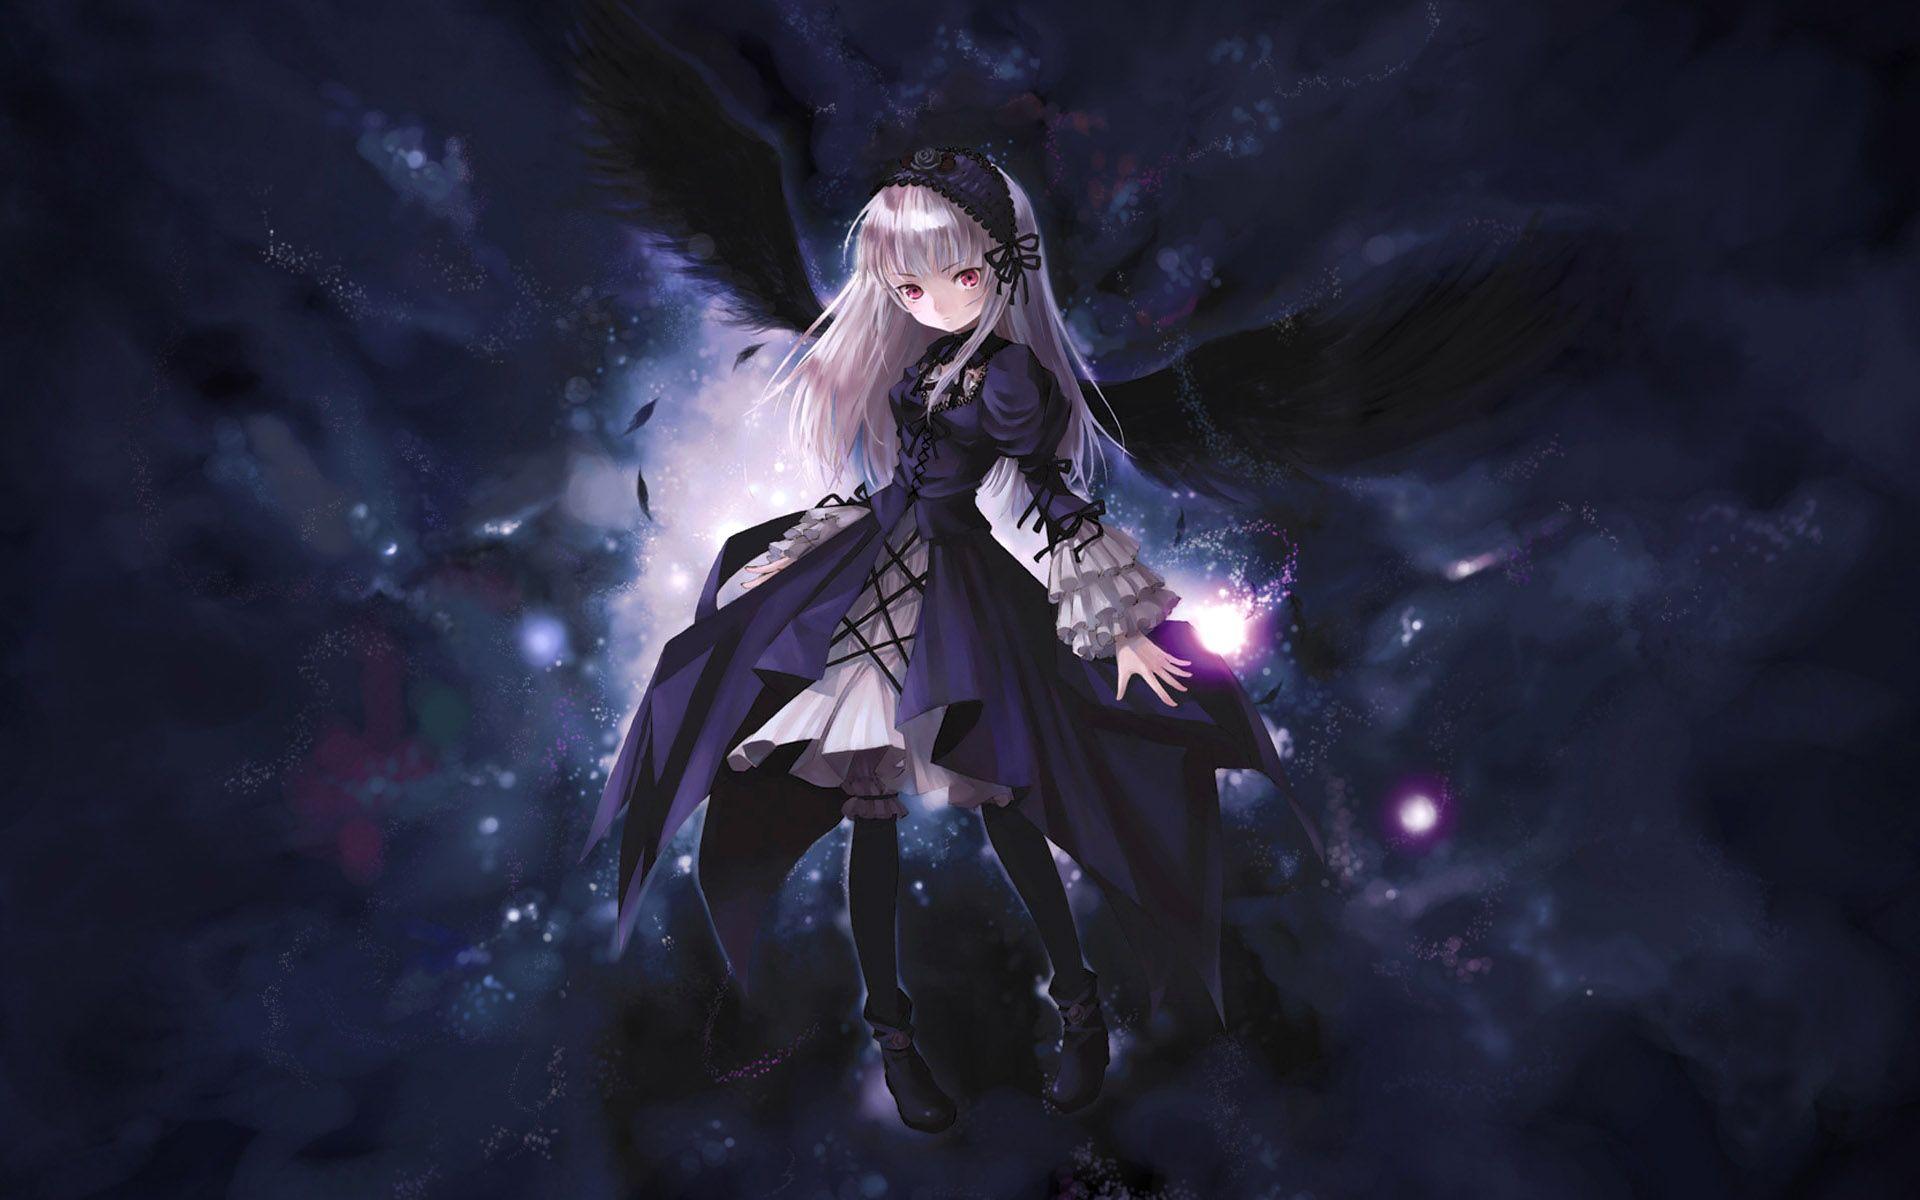 Anime Dark Angel Wallpaper Hd